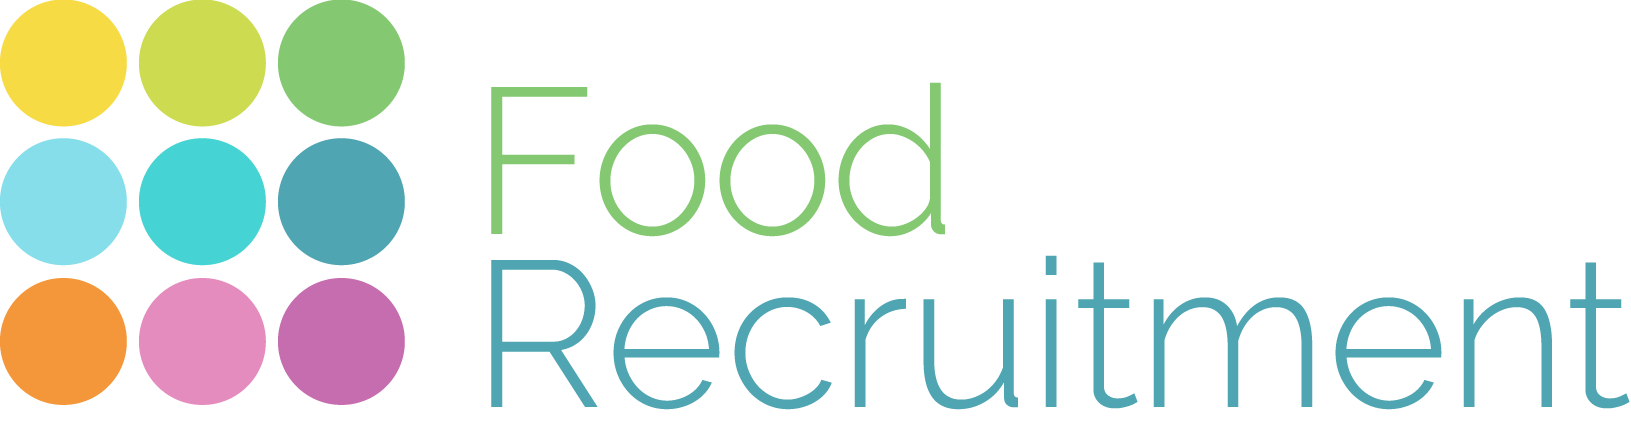 Food Recruitment